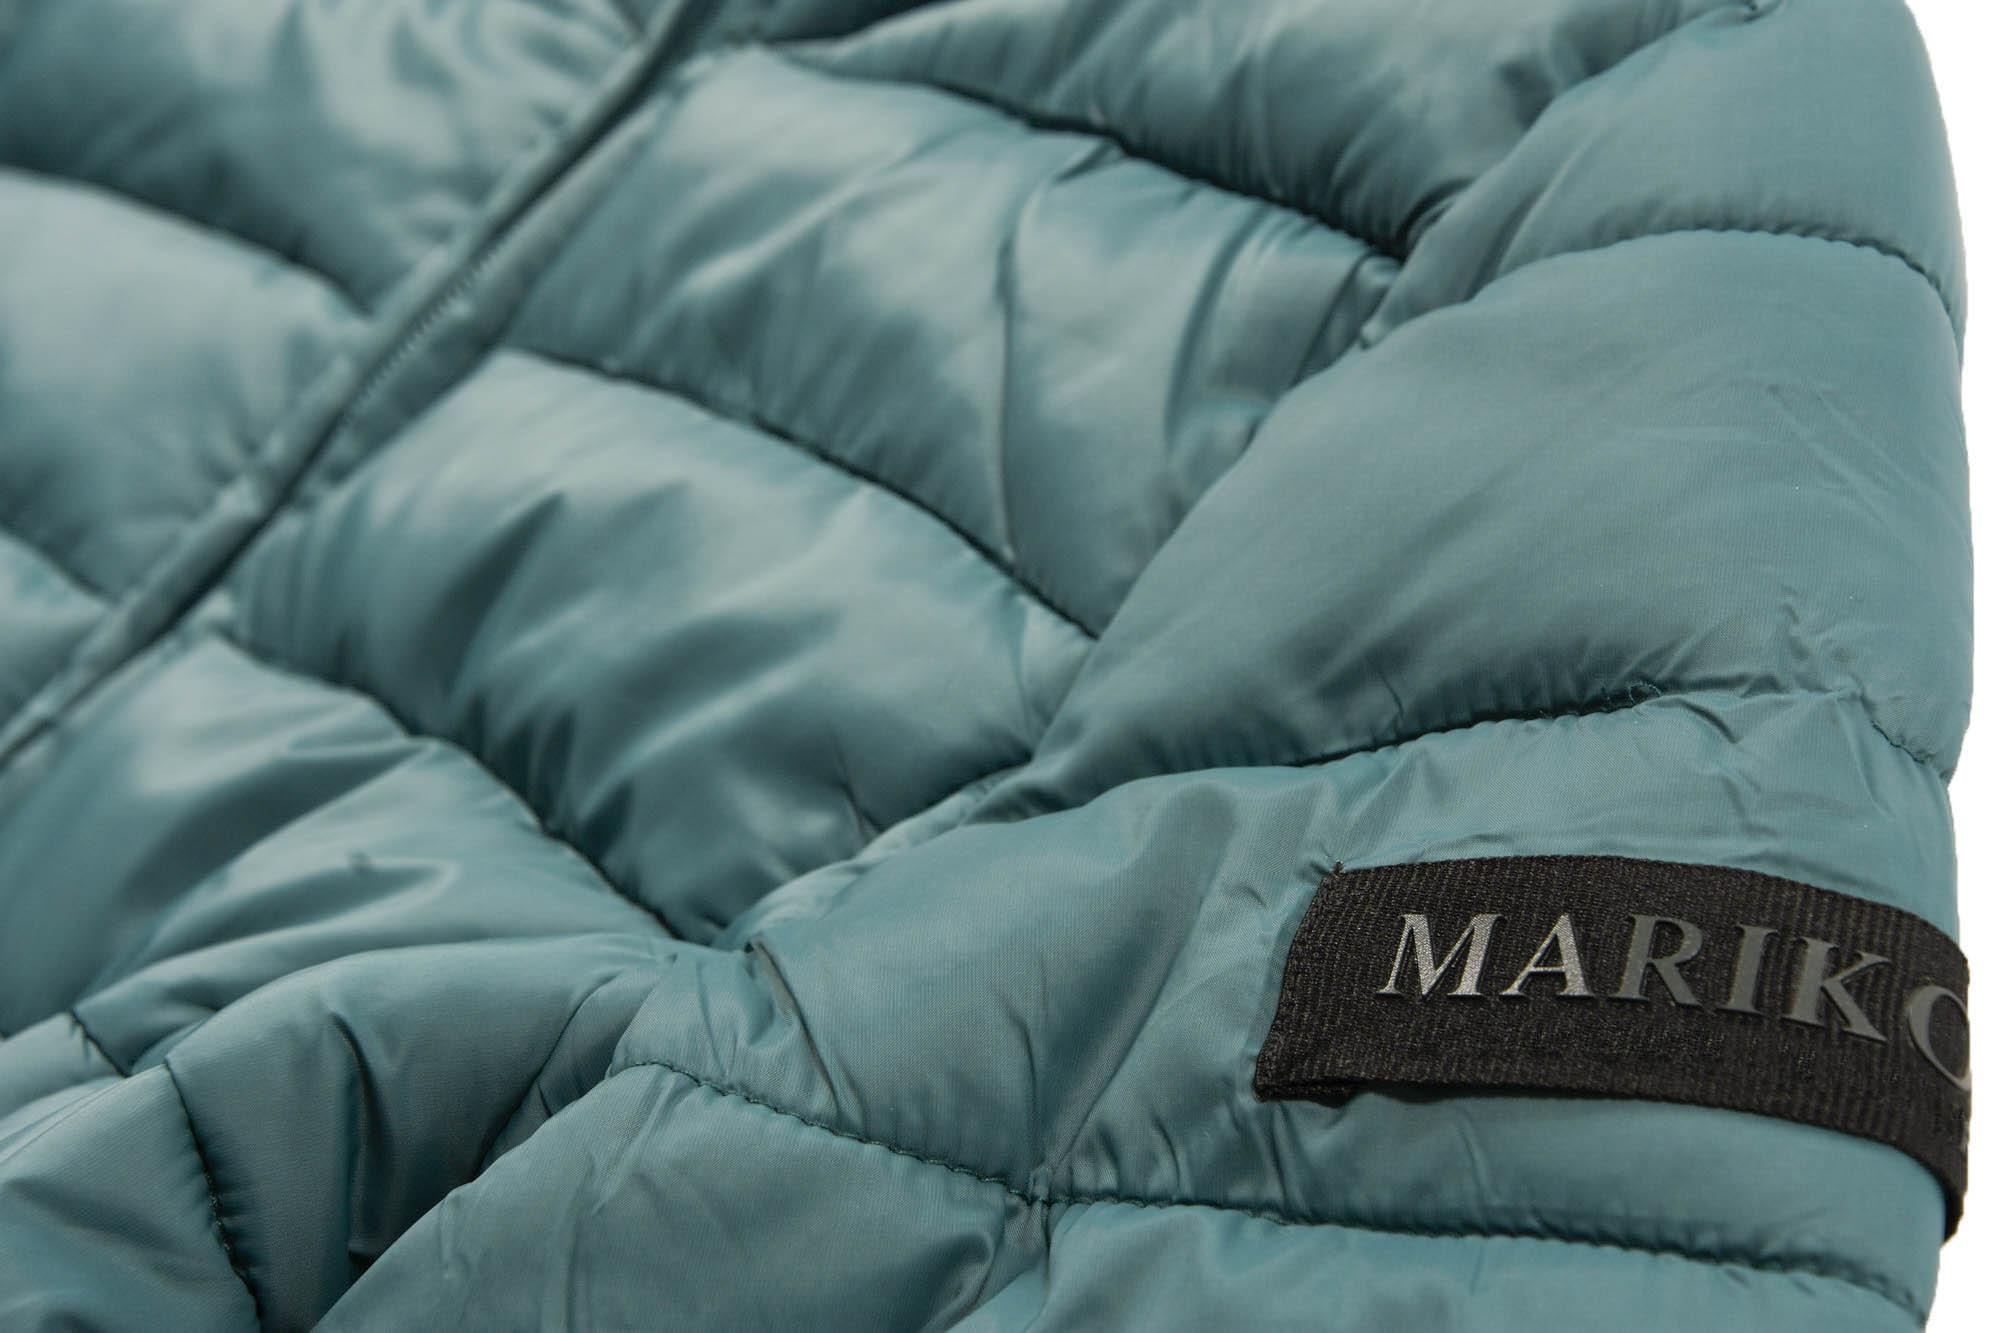 Marikoo-Lucy-Damen-Jacke-Steppjacke-Ubergangsjacke-gesteppt-Stepp-NEU-B651 Indexbild 45